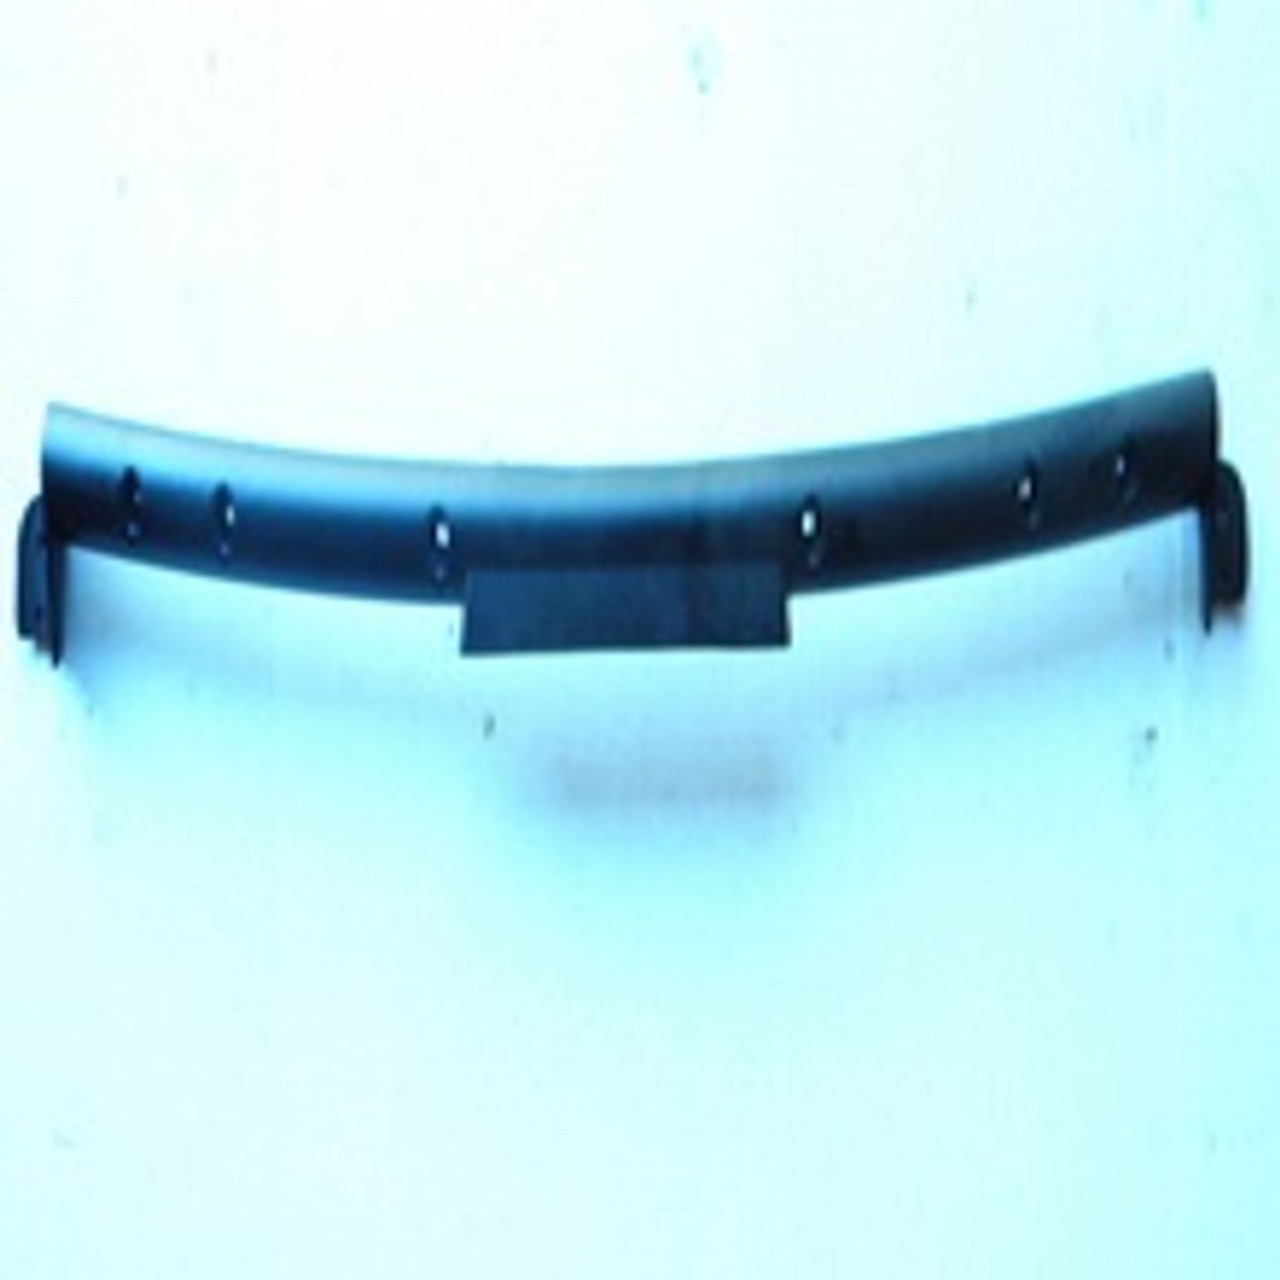 Sears Nordic Track Treadmill Model 249751 T 5.5 Pulse Bar Part 283678